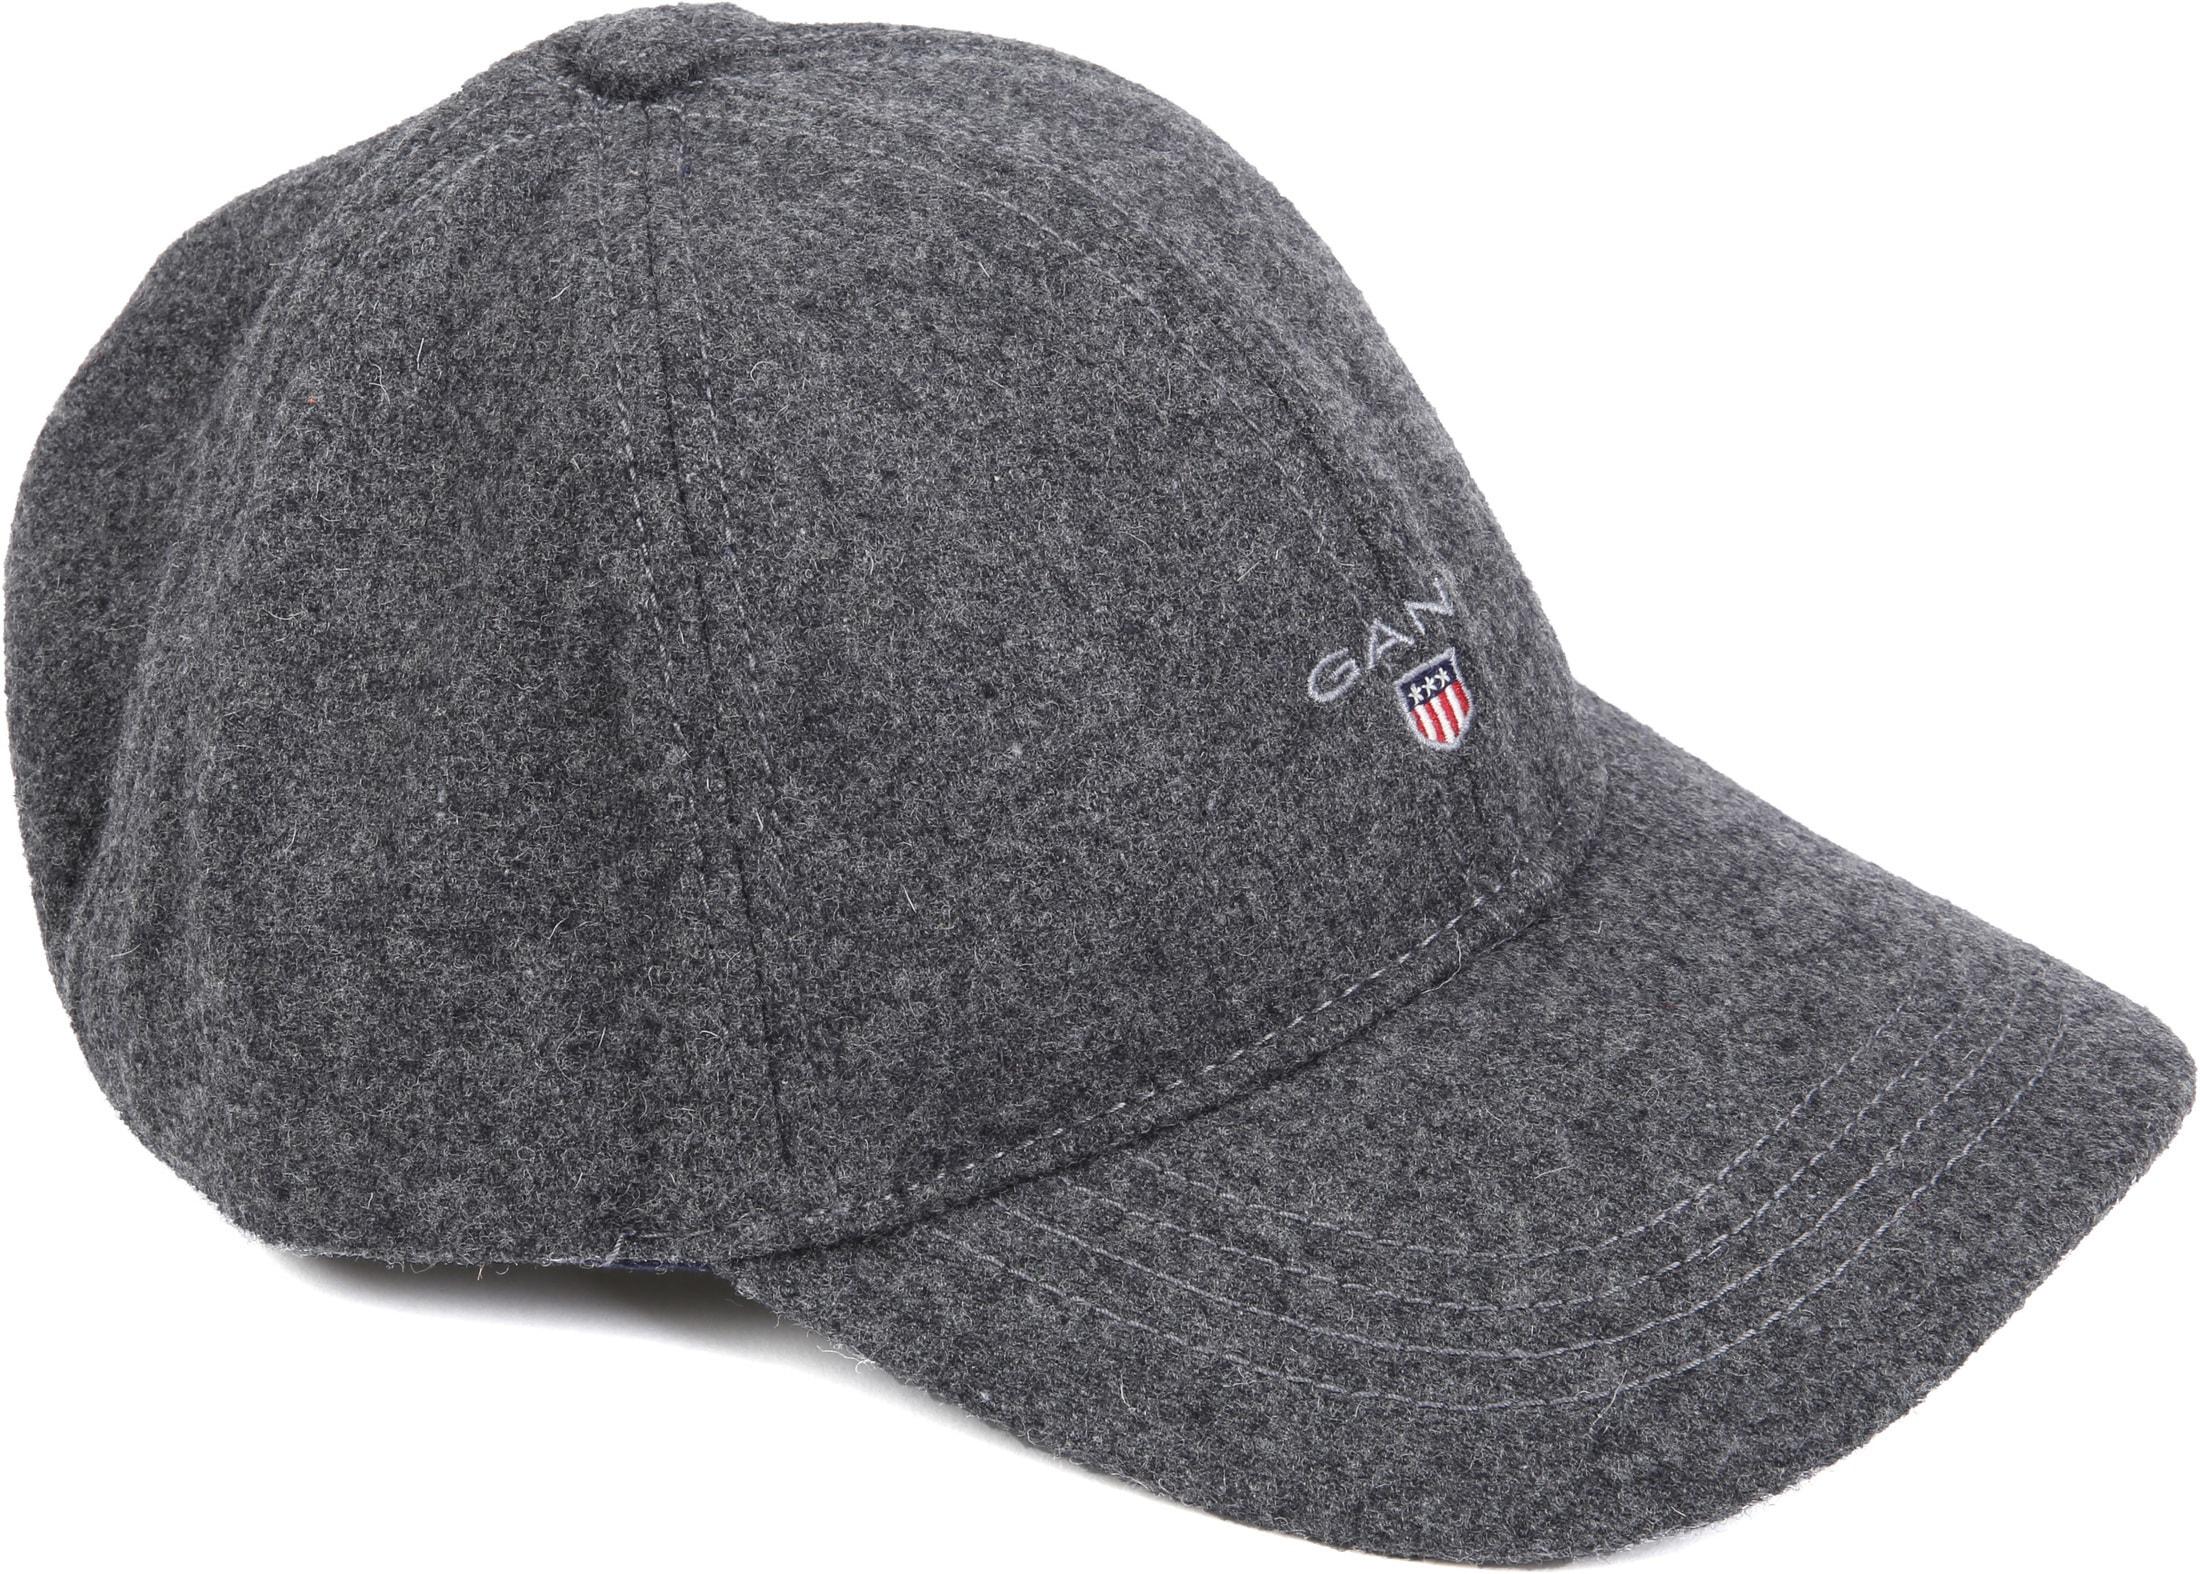 c2ef6d898a0 Gant Melton Cap Dark Grey 9900006-92 order online